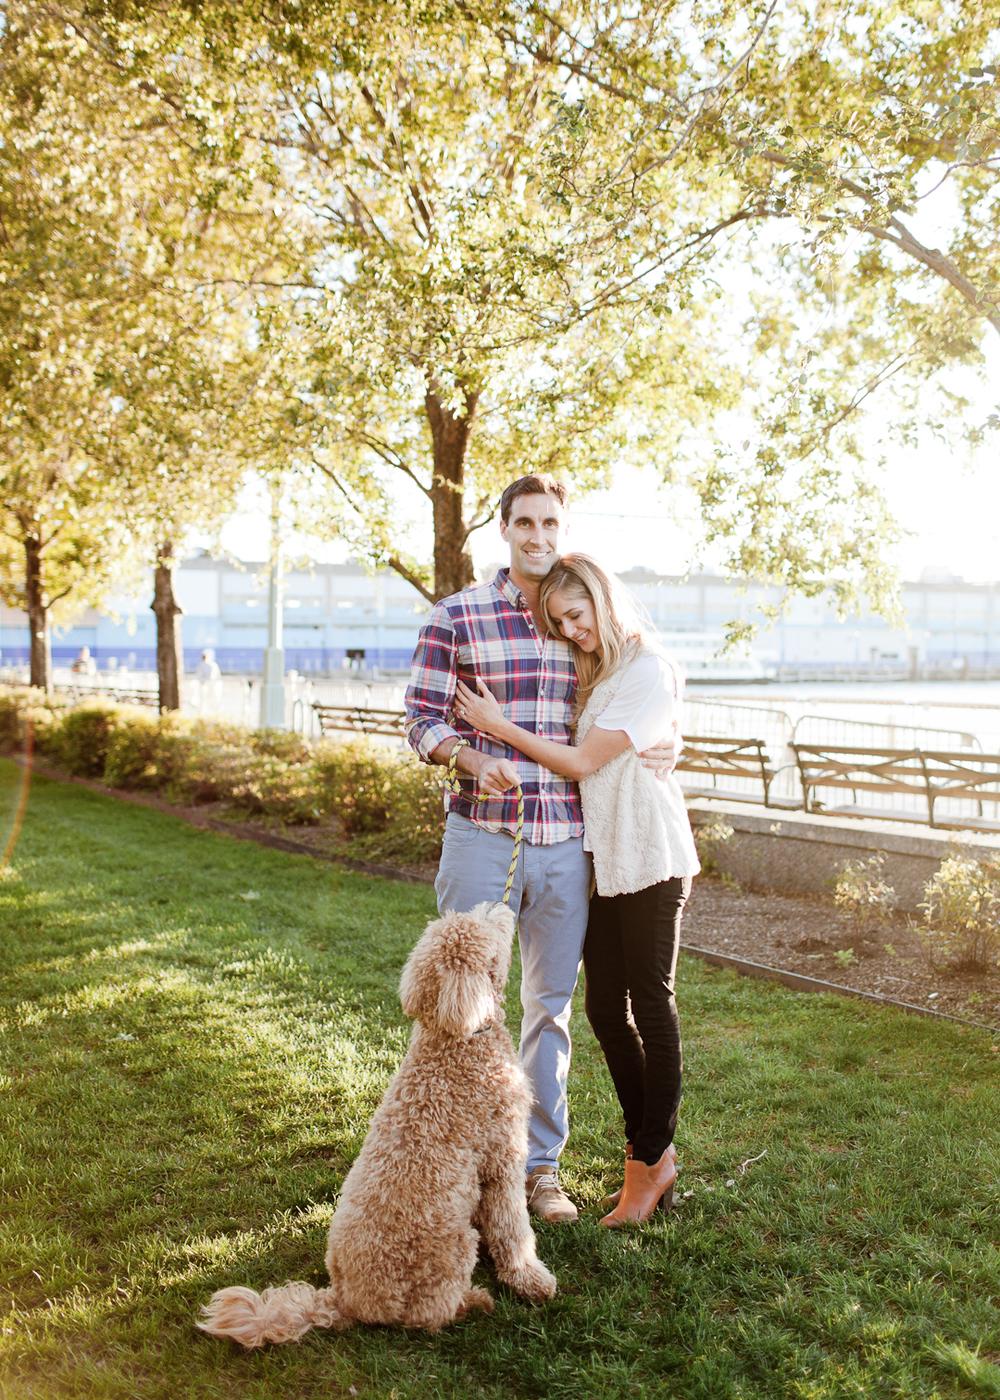 Melissa Kruse Photography - Daniece & Chris West Village Engagement Photos-134.jpg